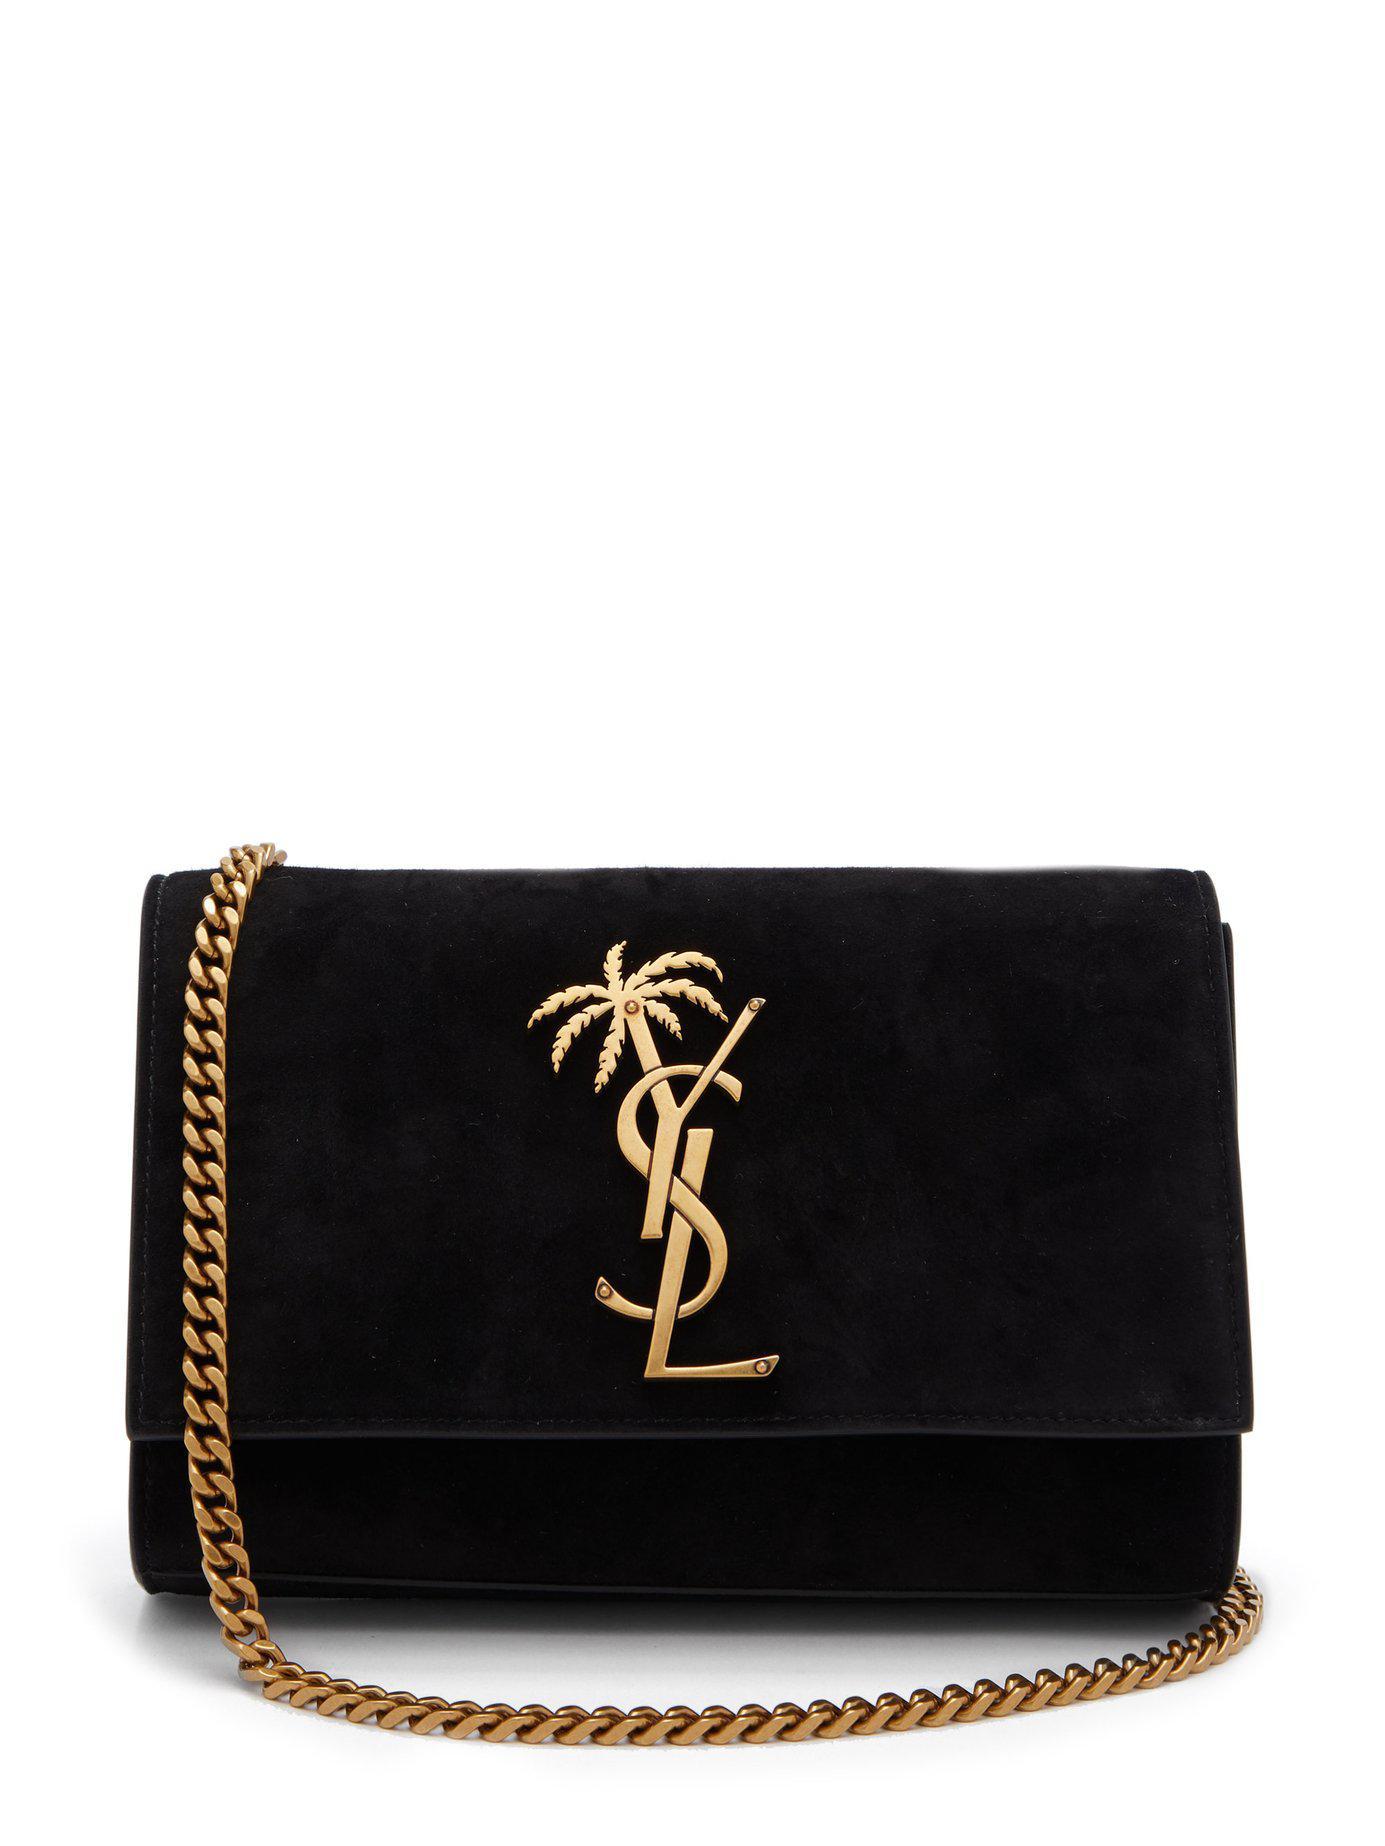 a7b9fd92e7 Saint Laurent. Women s Black Kate Palm Tree Monogram Suede Cross Body Bag